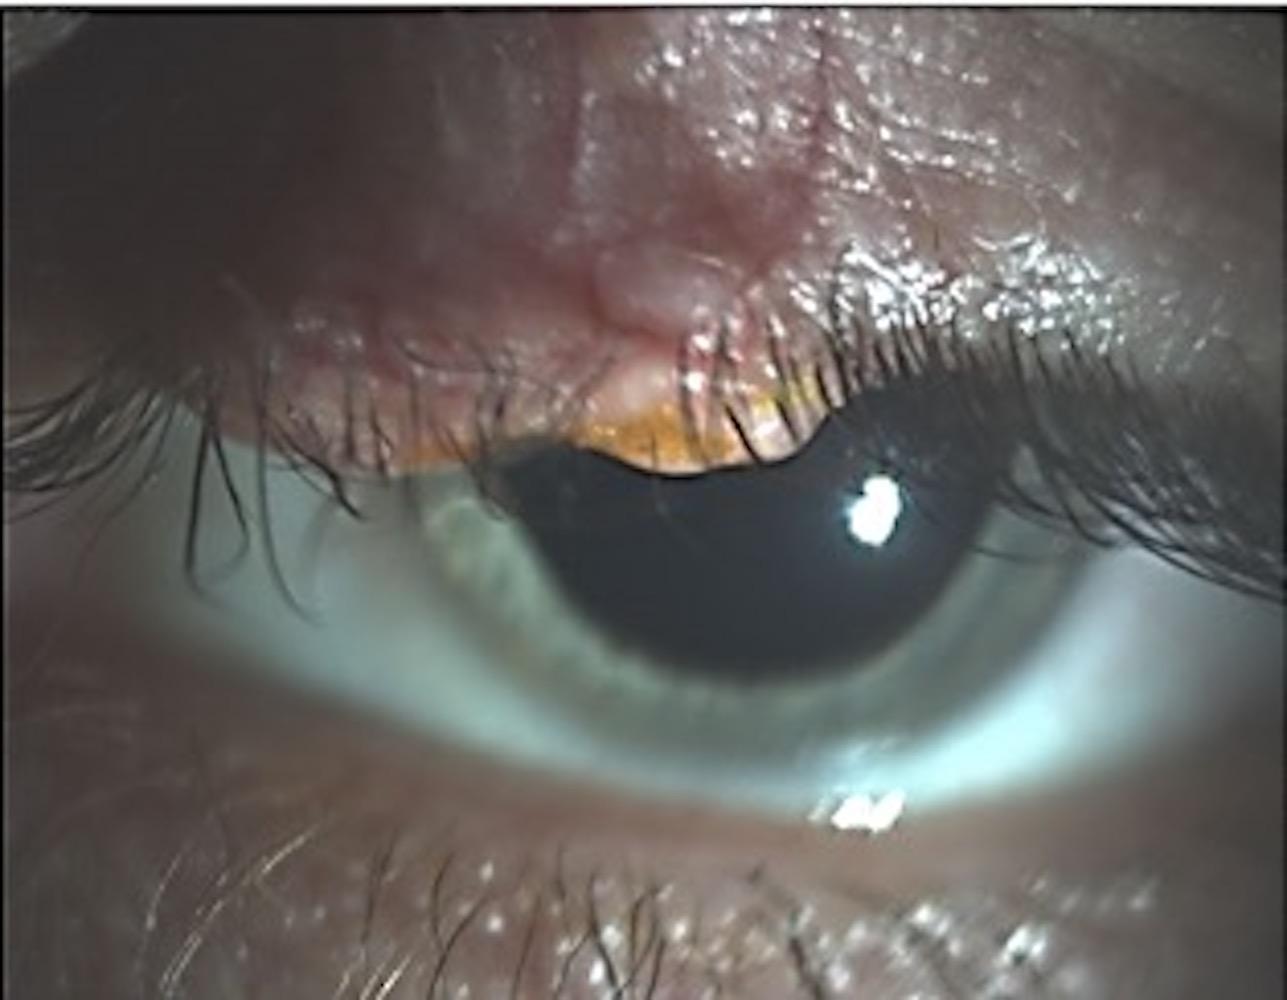 Periocular sebaceous carcinoma